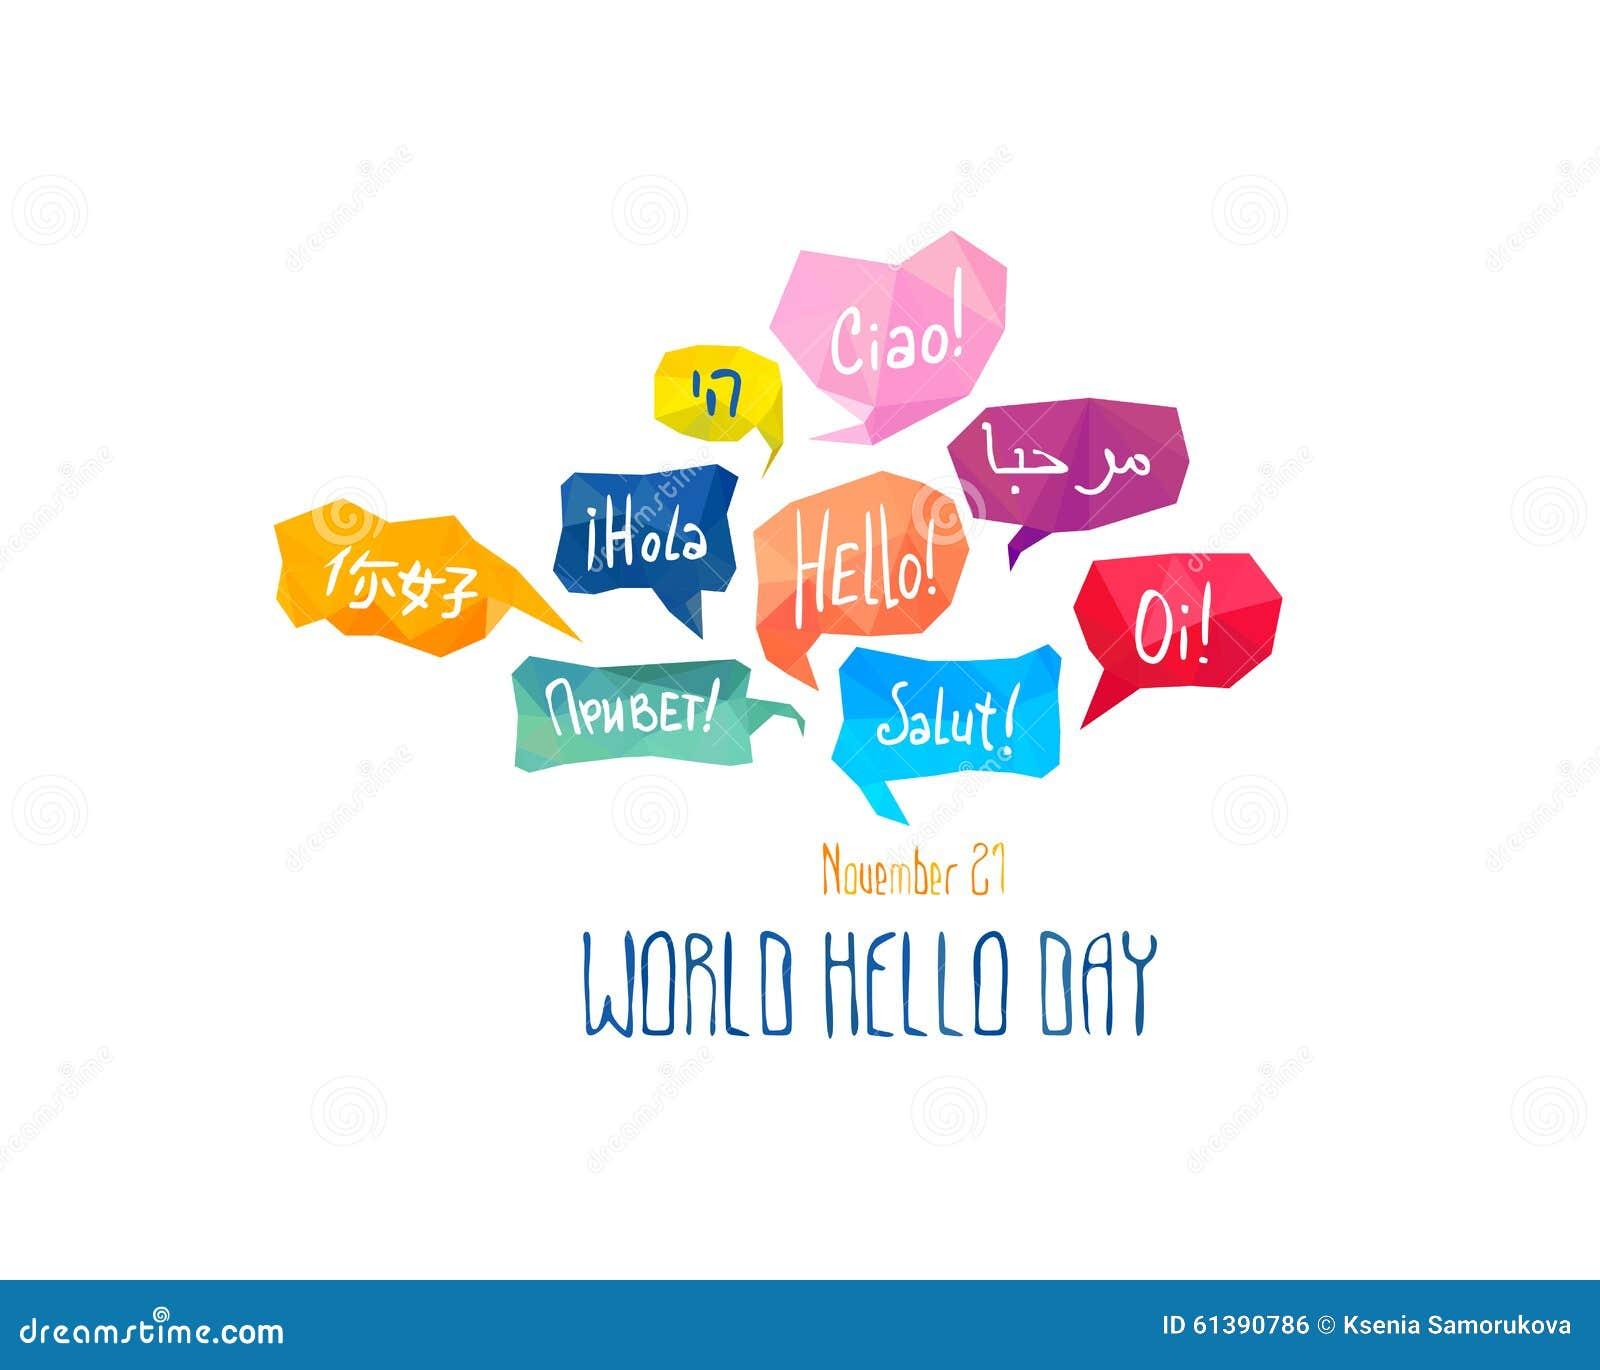 Holiday November 21 World Hello Day Stock Vector Illustration